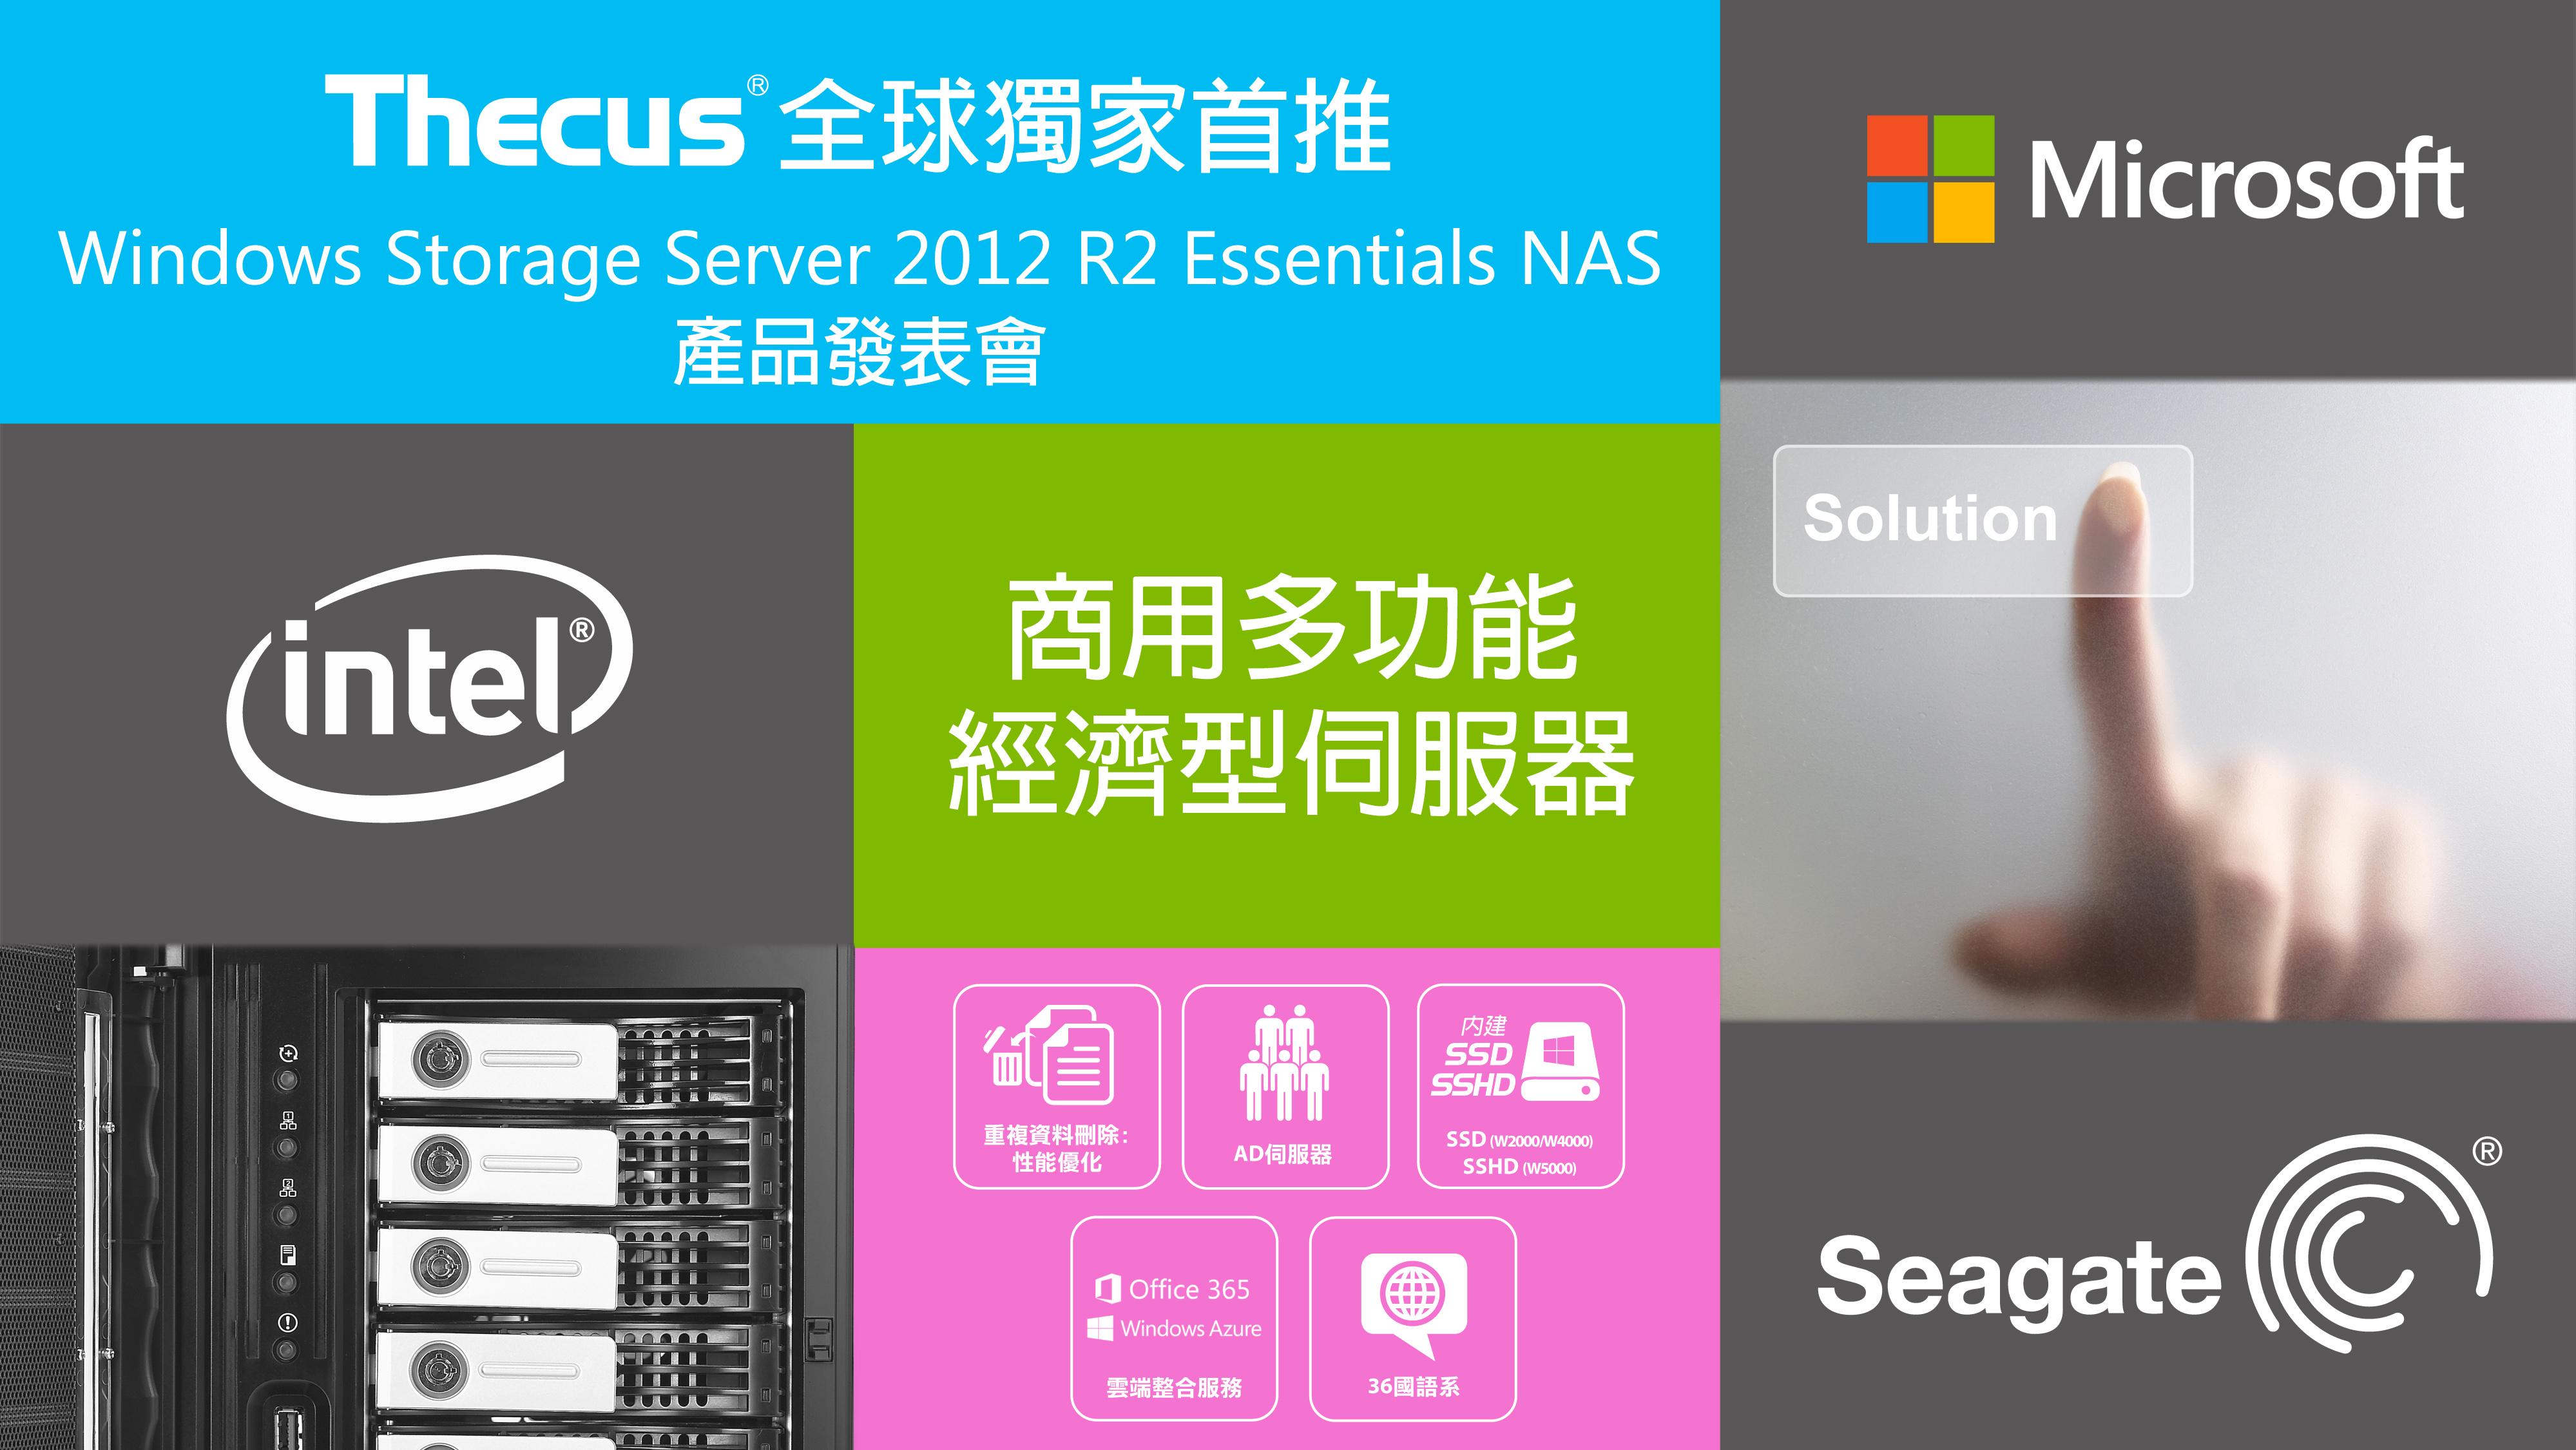 Microsoft, Intel,  Thecus 發表全球第一台 Wintel 架構WSS  Essentials 網路儲存伺服器